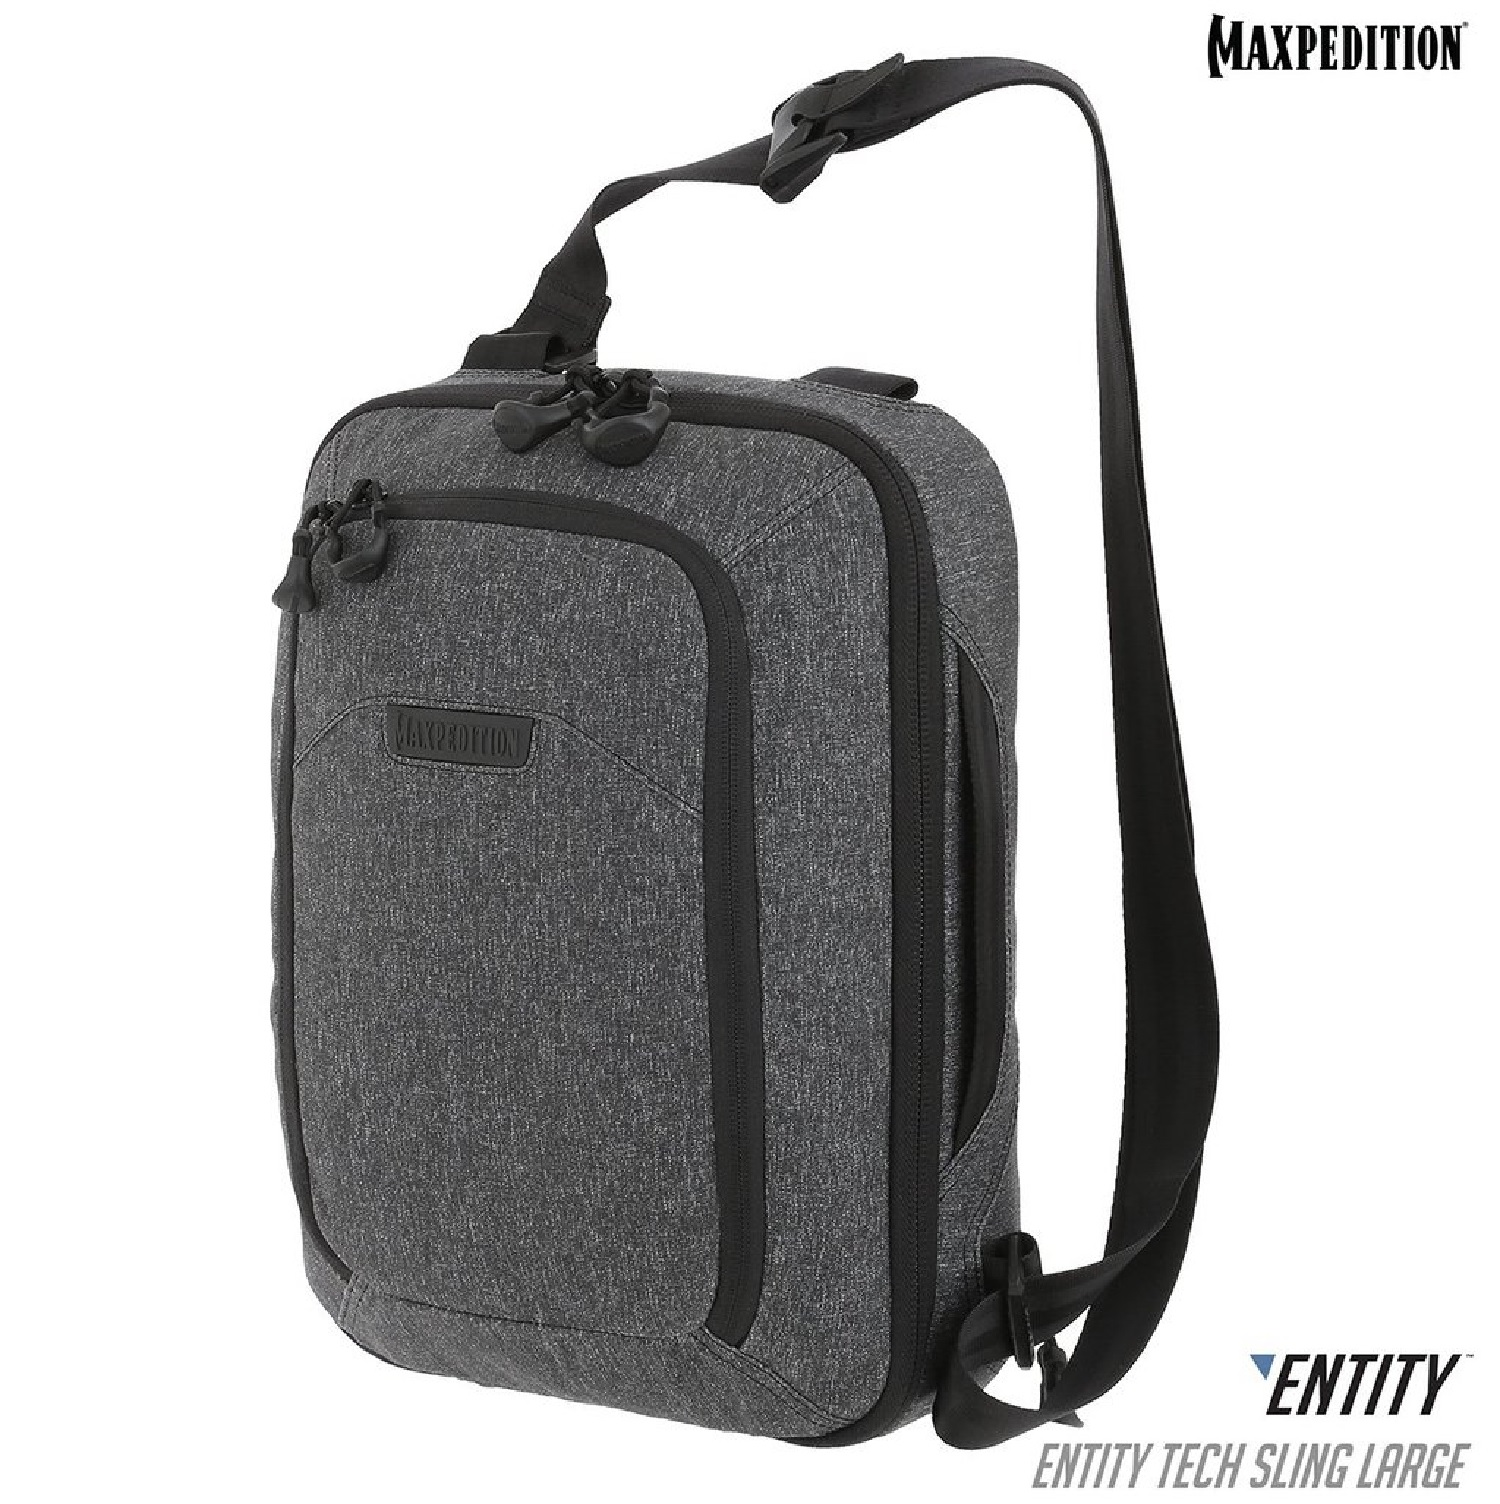 Maxpedition ENTITY Tech Sling Bag Small Charcoal NTTSLTSCH